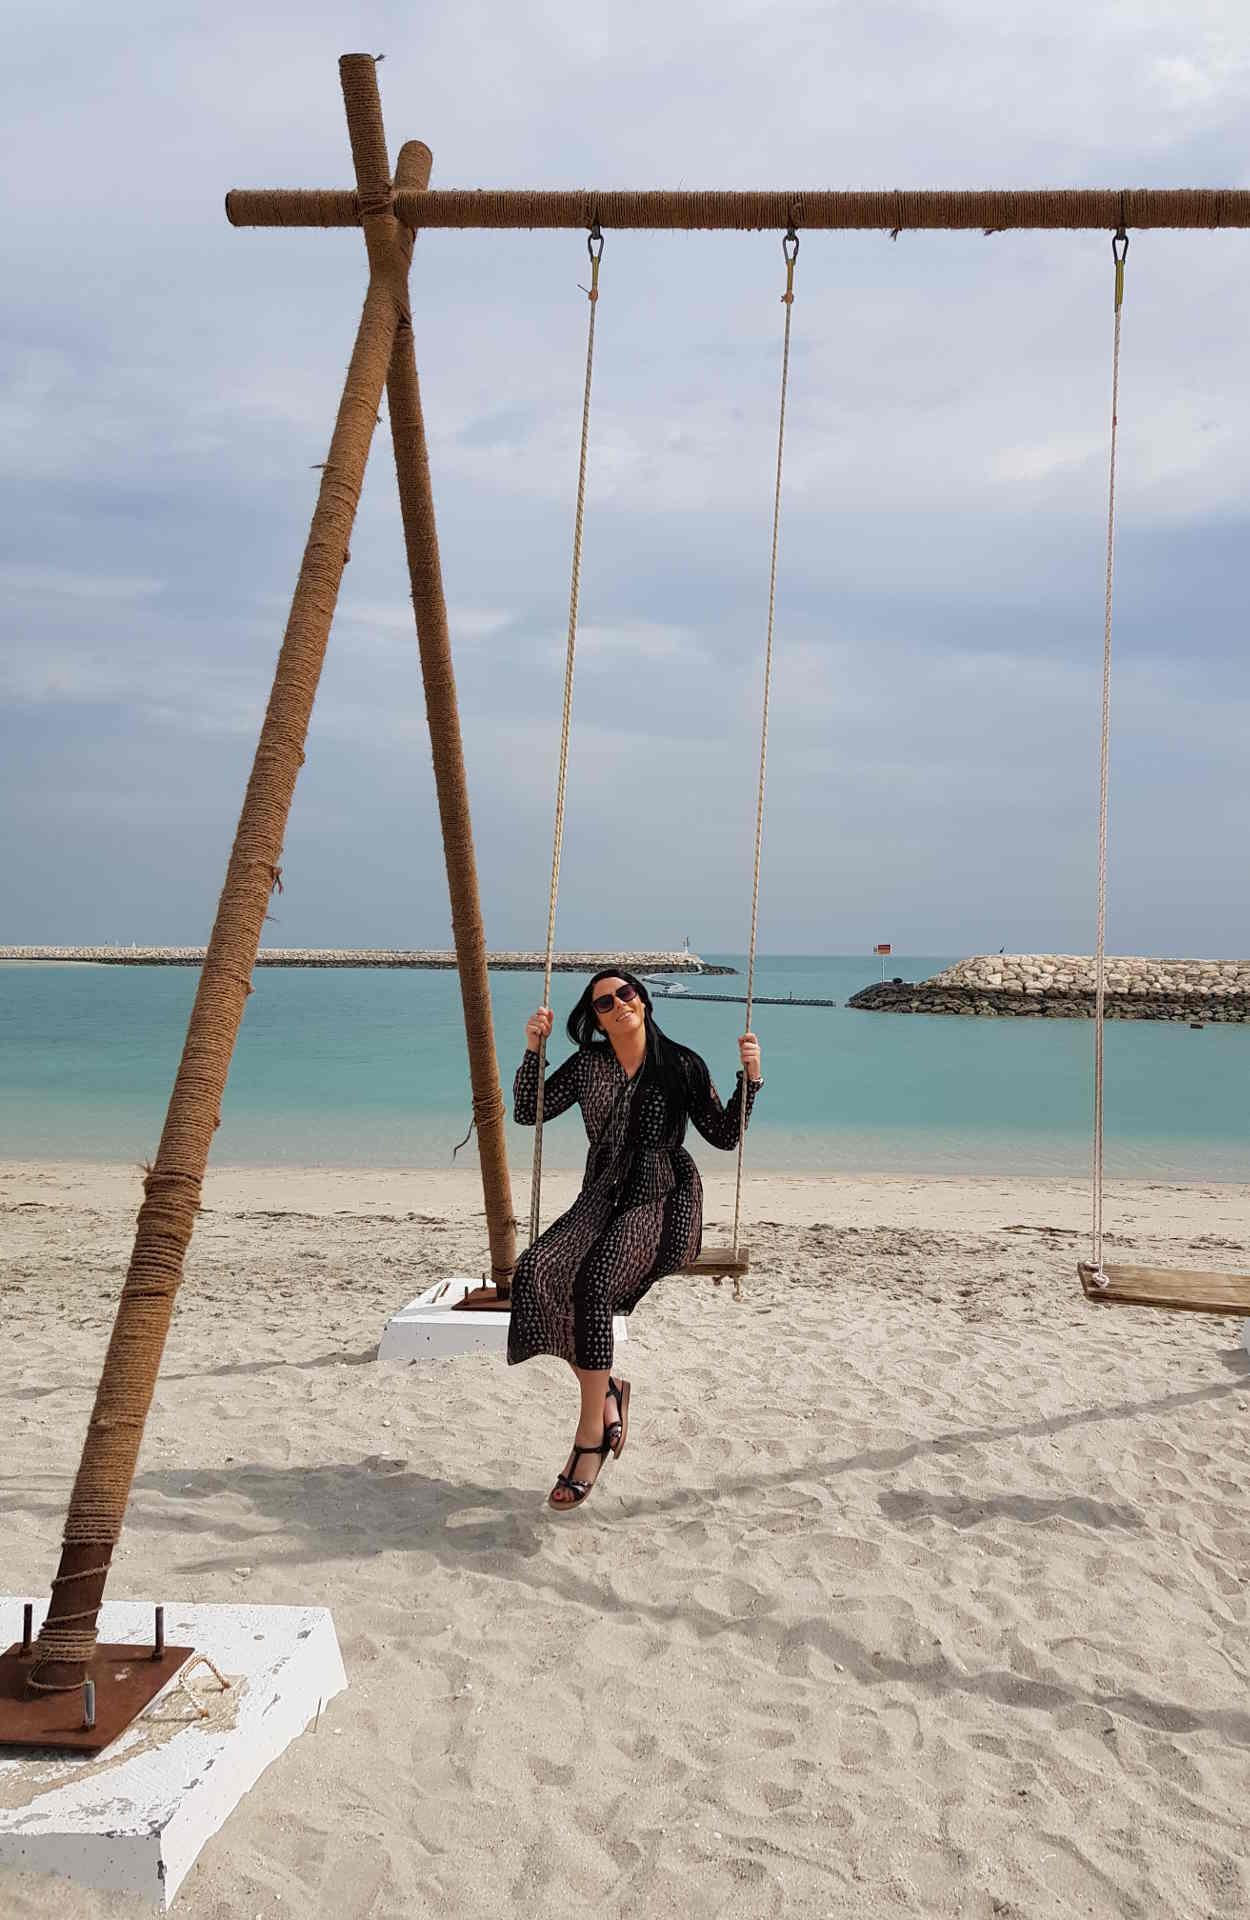 Unsere Kollegin in Bahrain